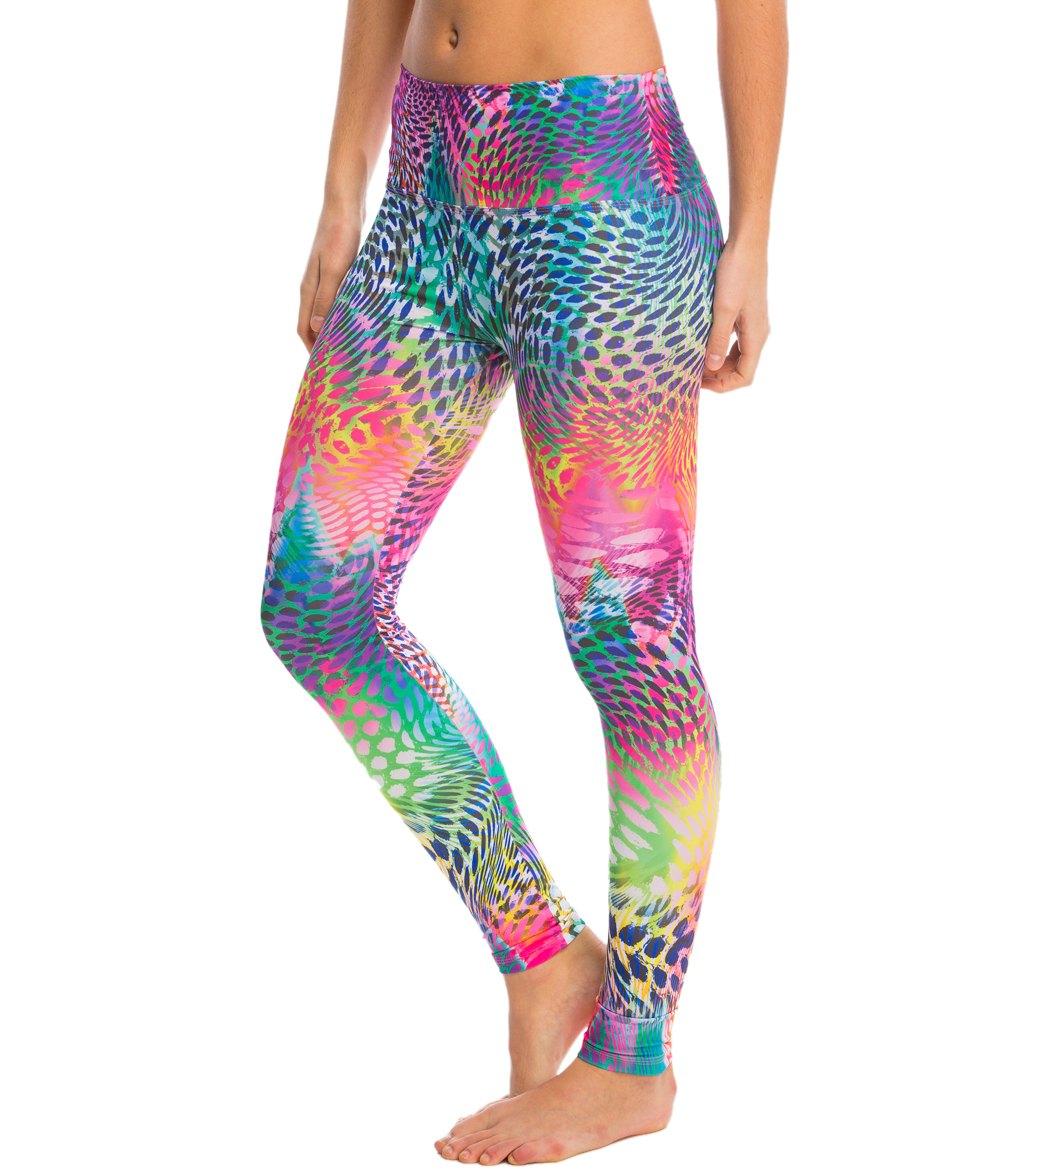 6e52876bc7dd6 Om Shanti Clothing Rainbow Leopard Eco Yoga Leggings at YogaOutlet ...